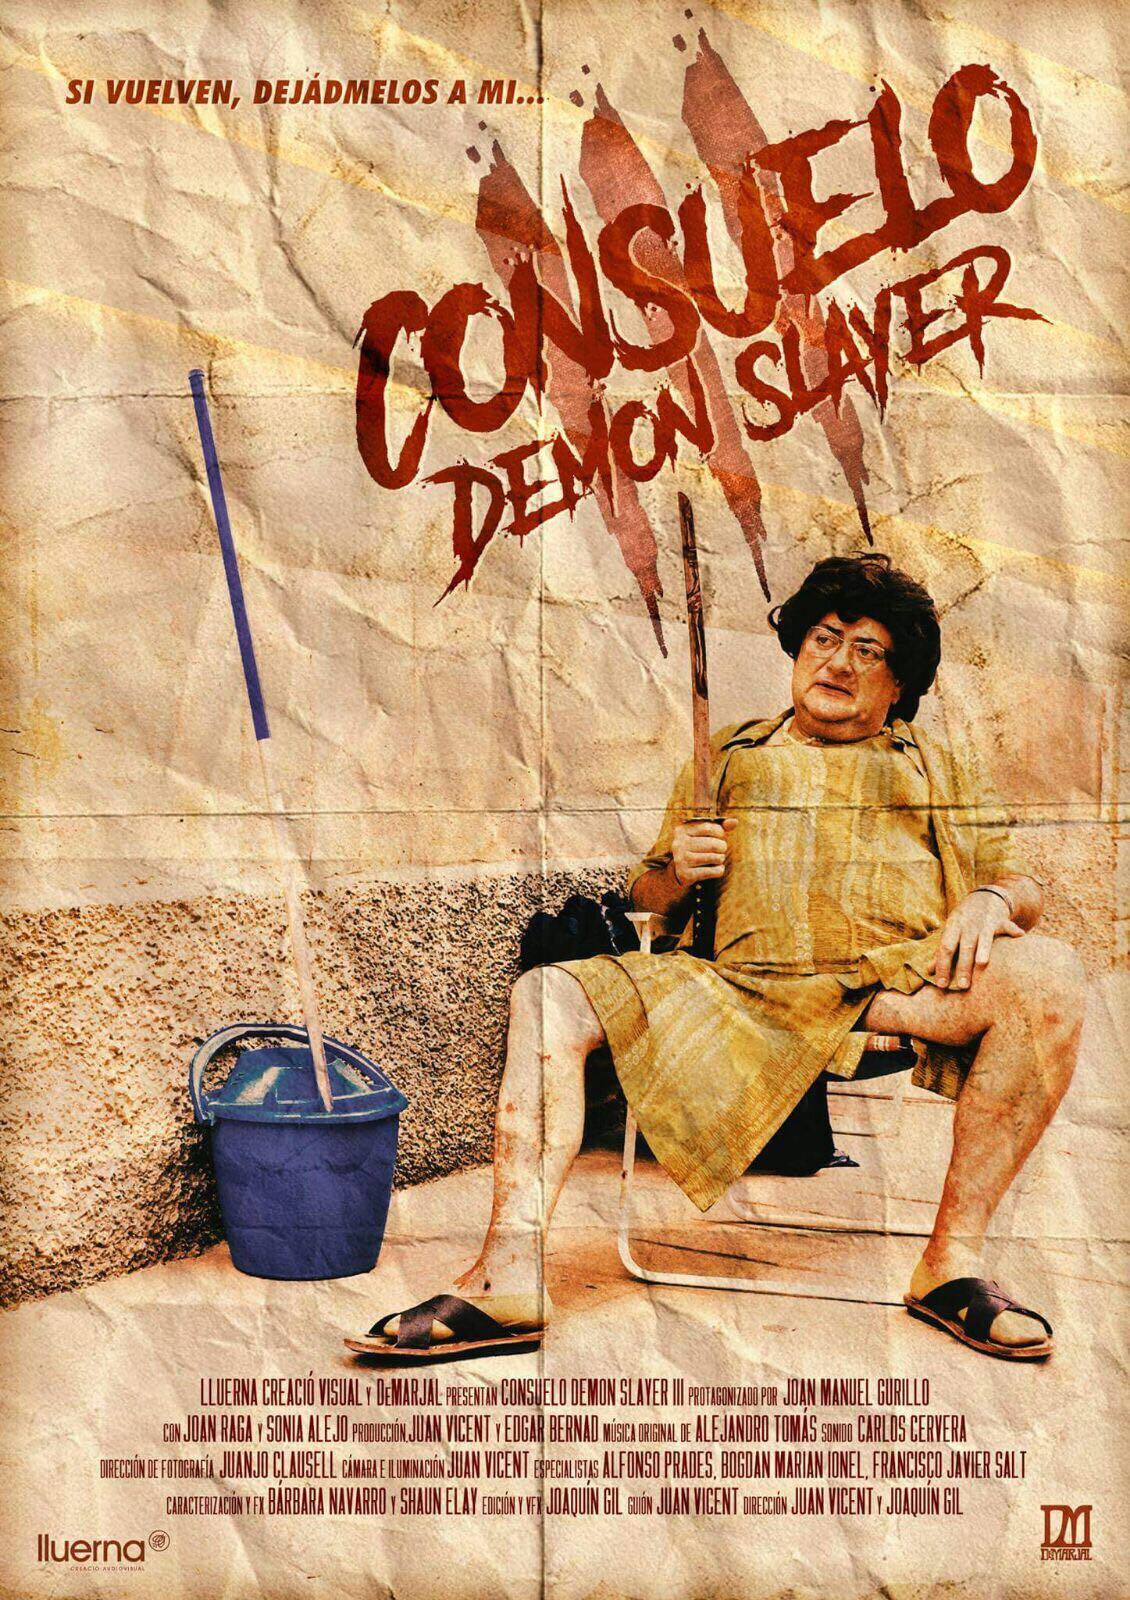 2017  -  Consuelo demon slayer. Protagonista.  Dirección Juan Vicent / Joaquin Gil.